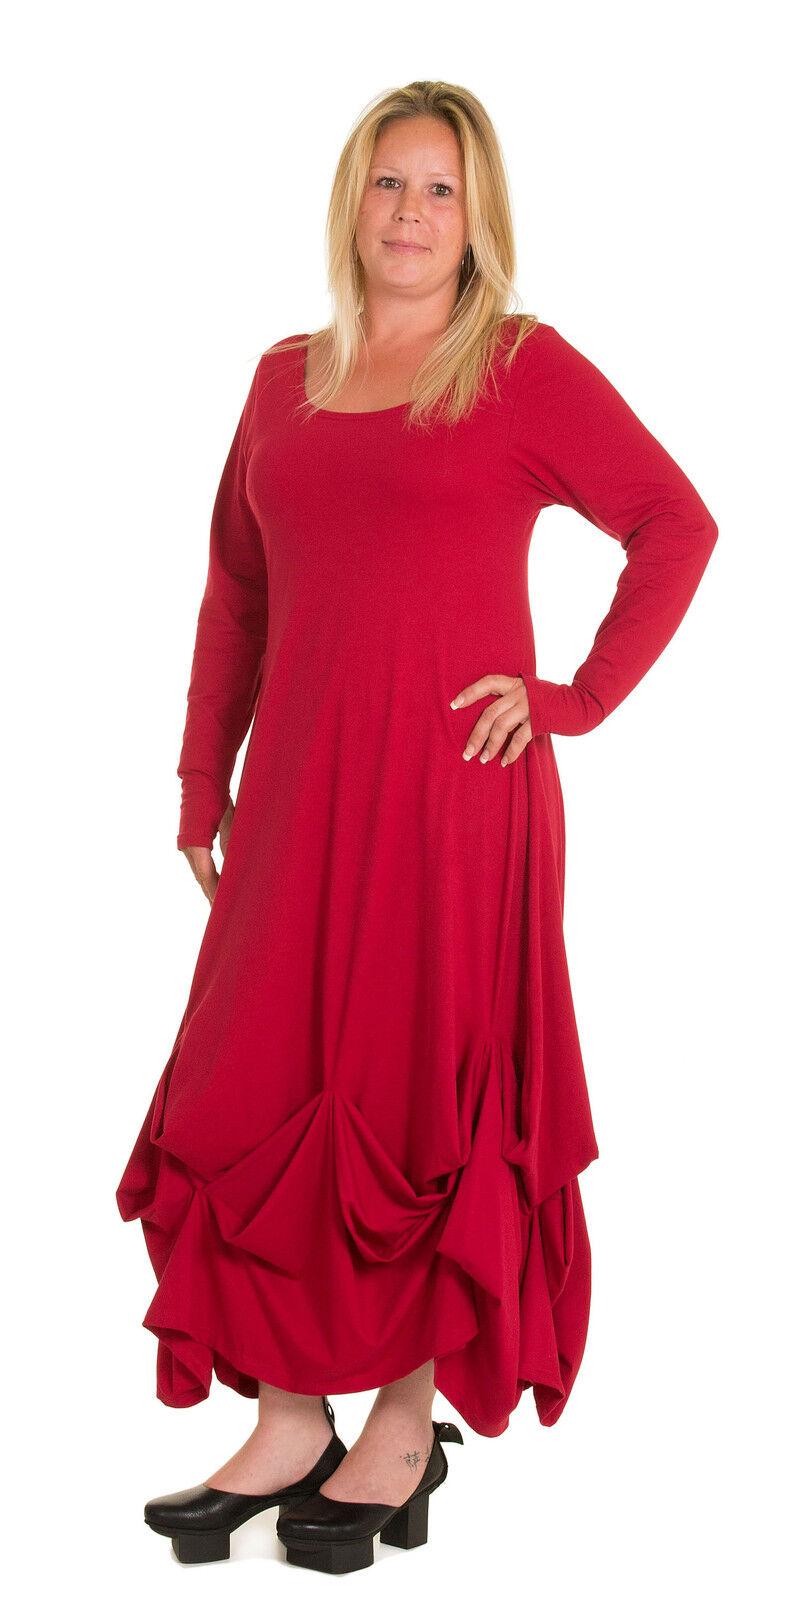 Idaretobe LAGENLOOK FLAG WOMENS DRESS Sizes UK14-22 US 10-18 PLUS SIZE